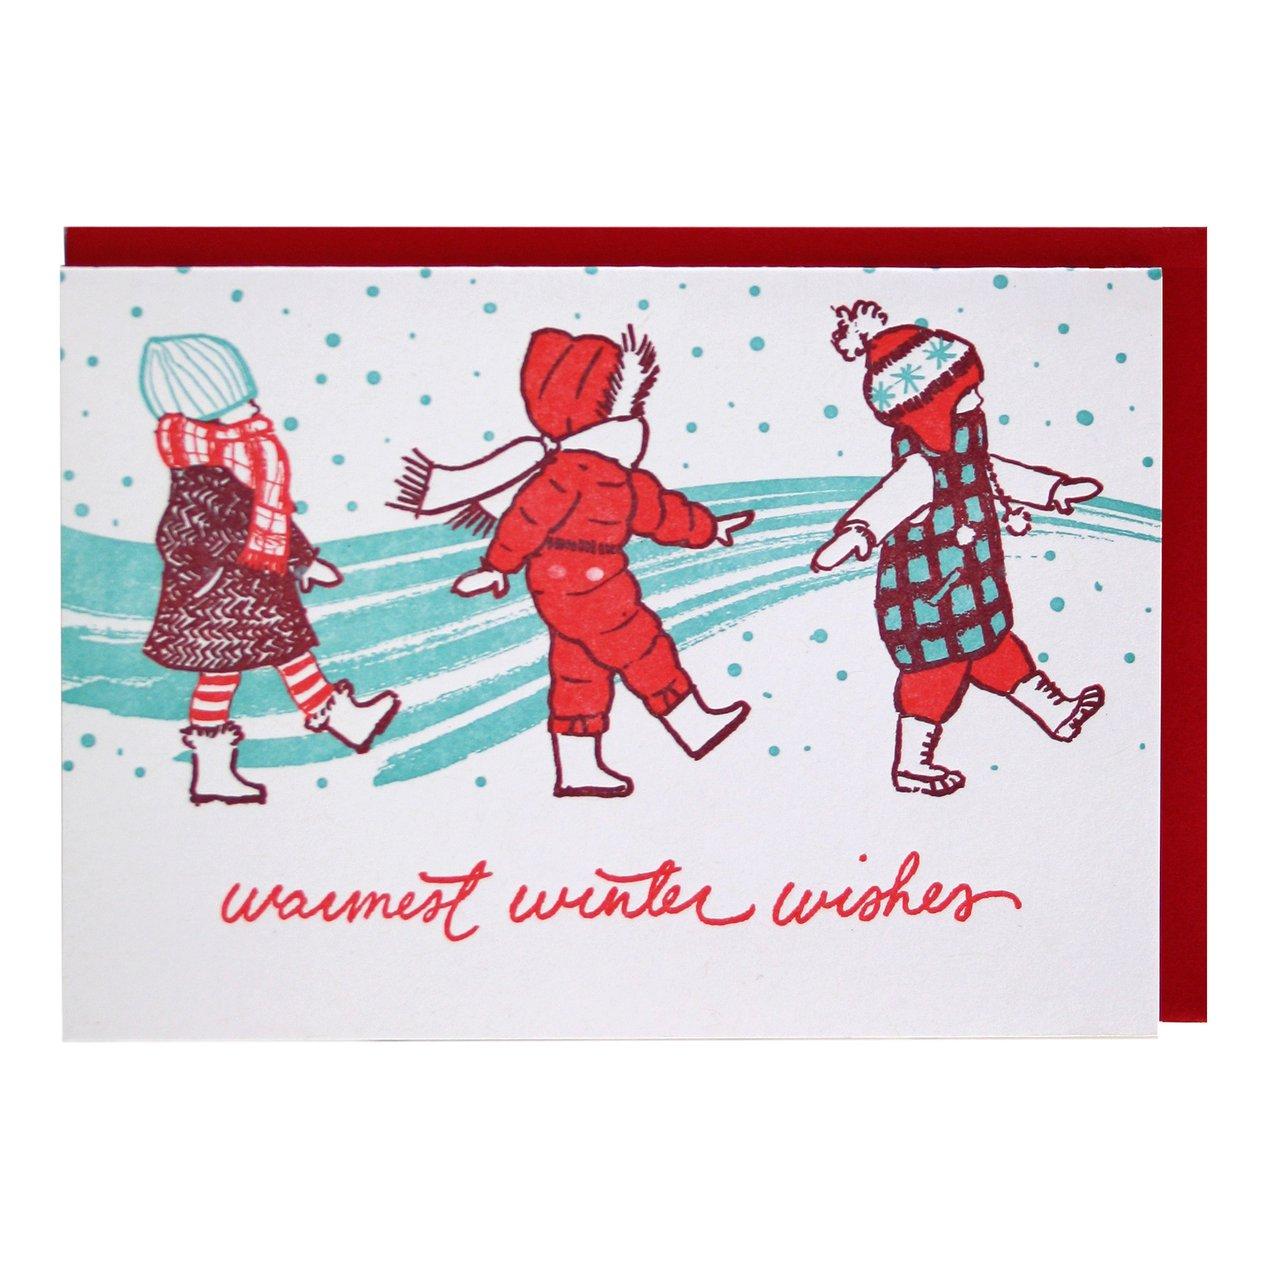 Bundled-Up-Kids-Holiday-Card_1280x1280.jpg